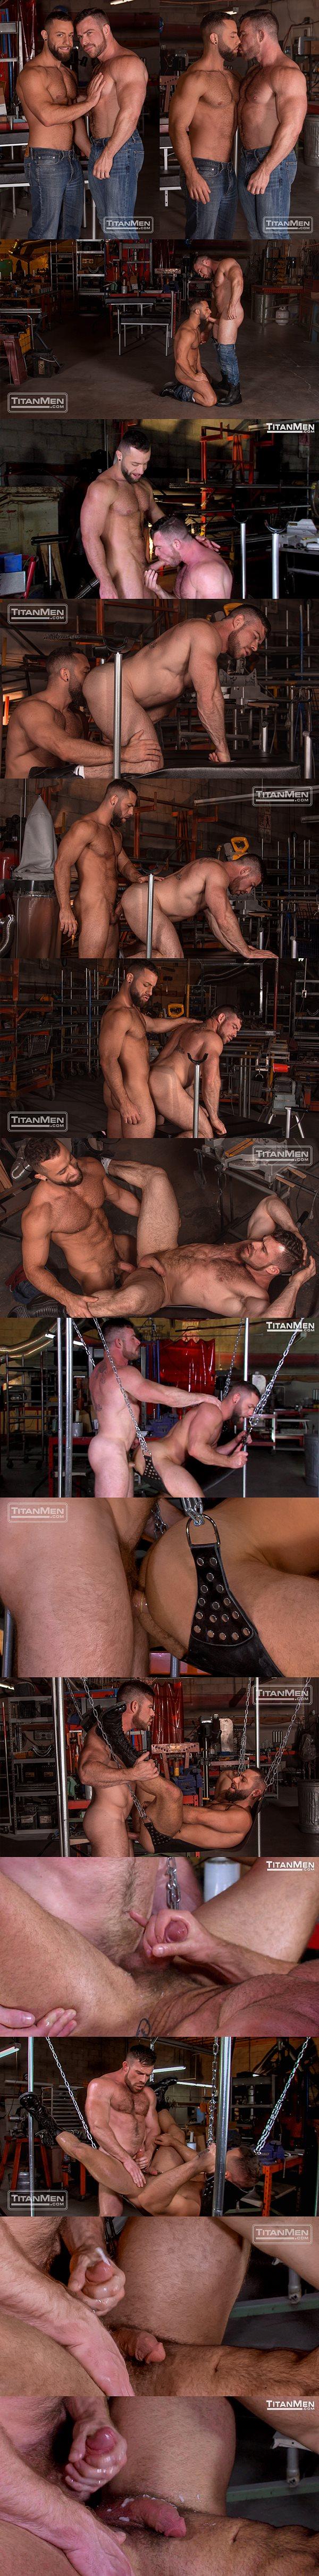 Muscle hunk Liam Knox flip-fucks Eddy CeeTee in the sling factory at Titanmen 02